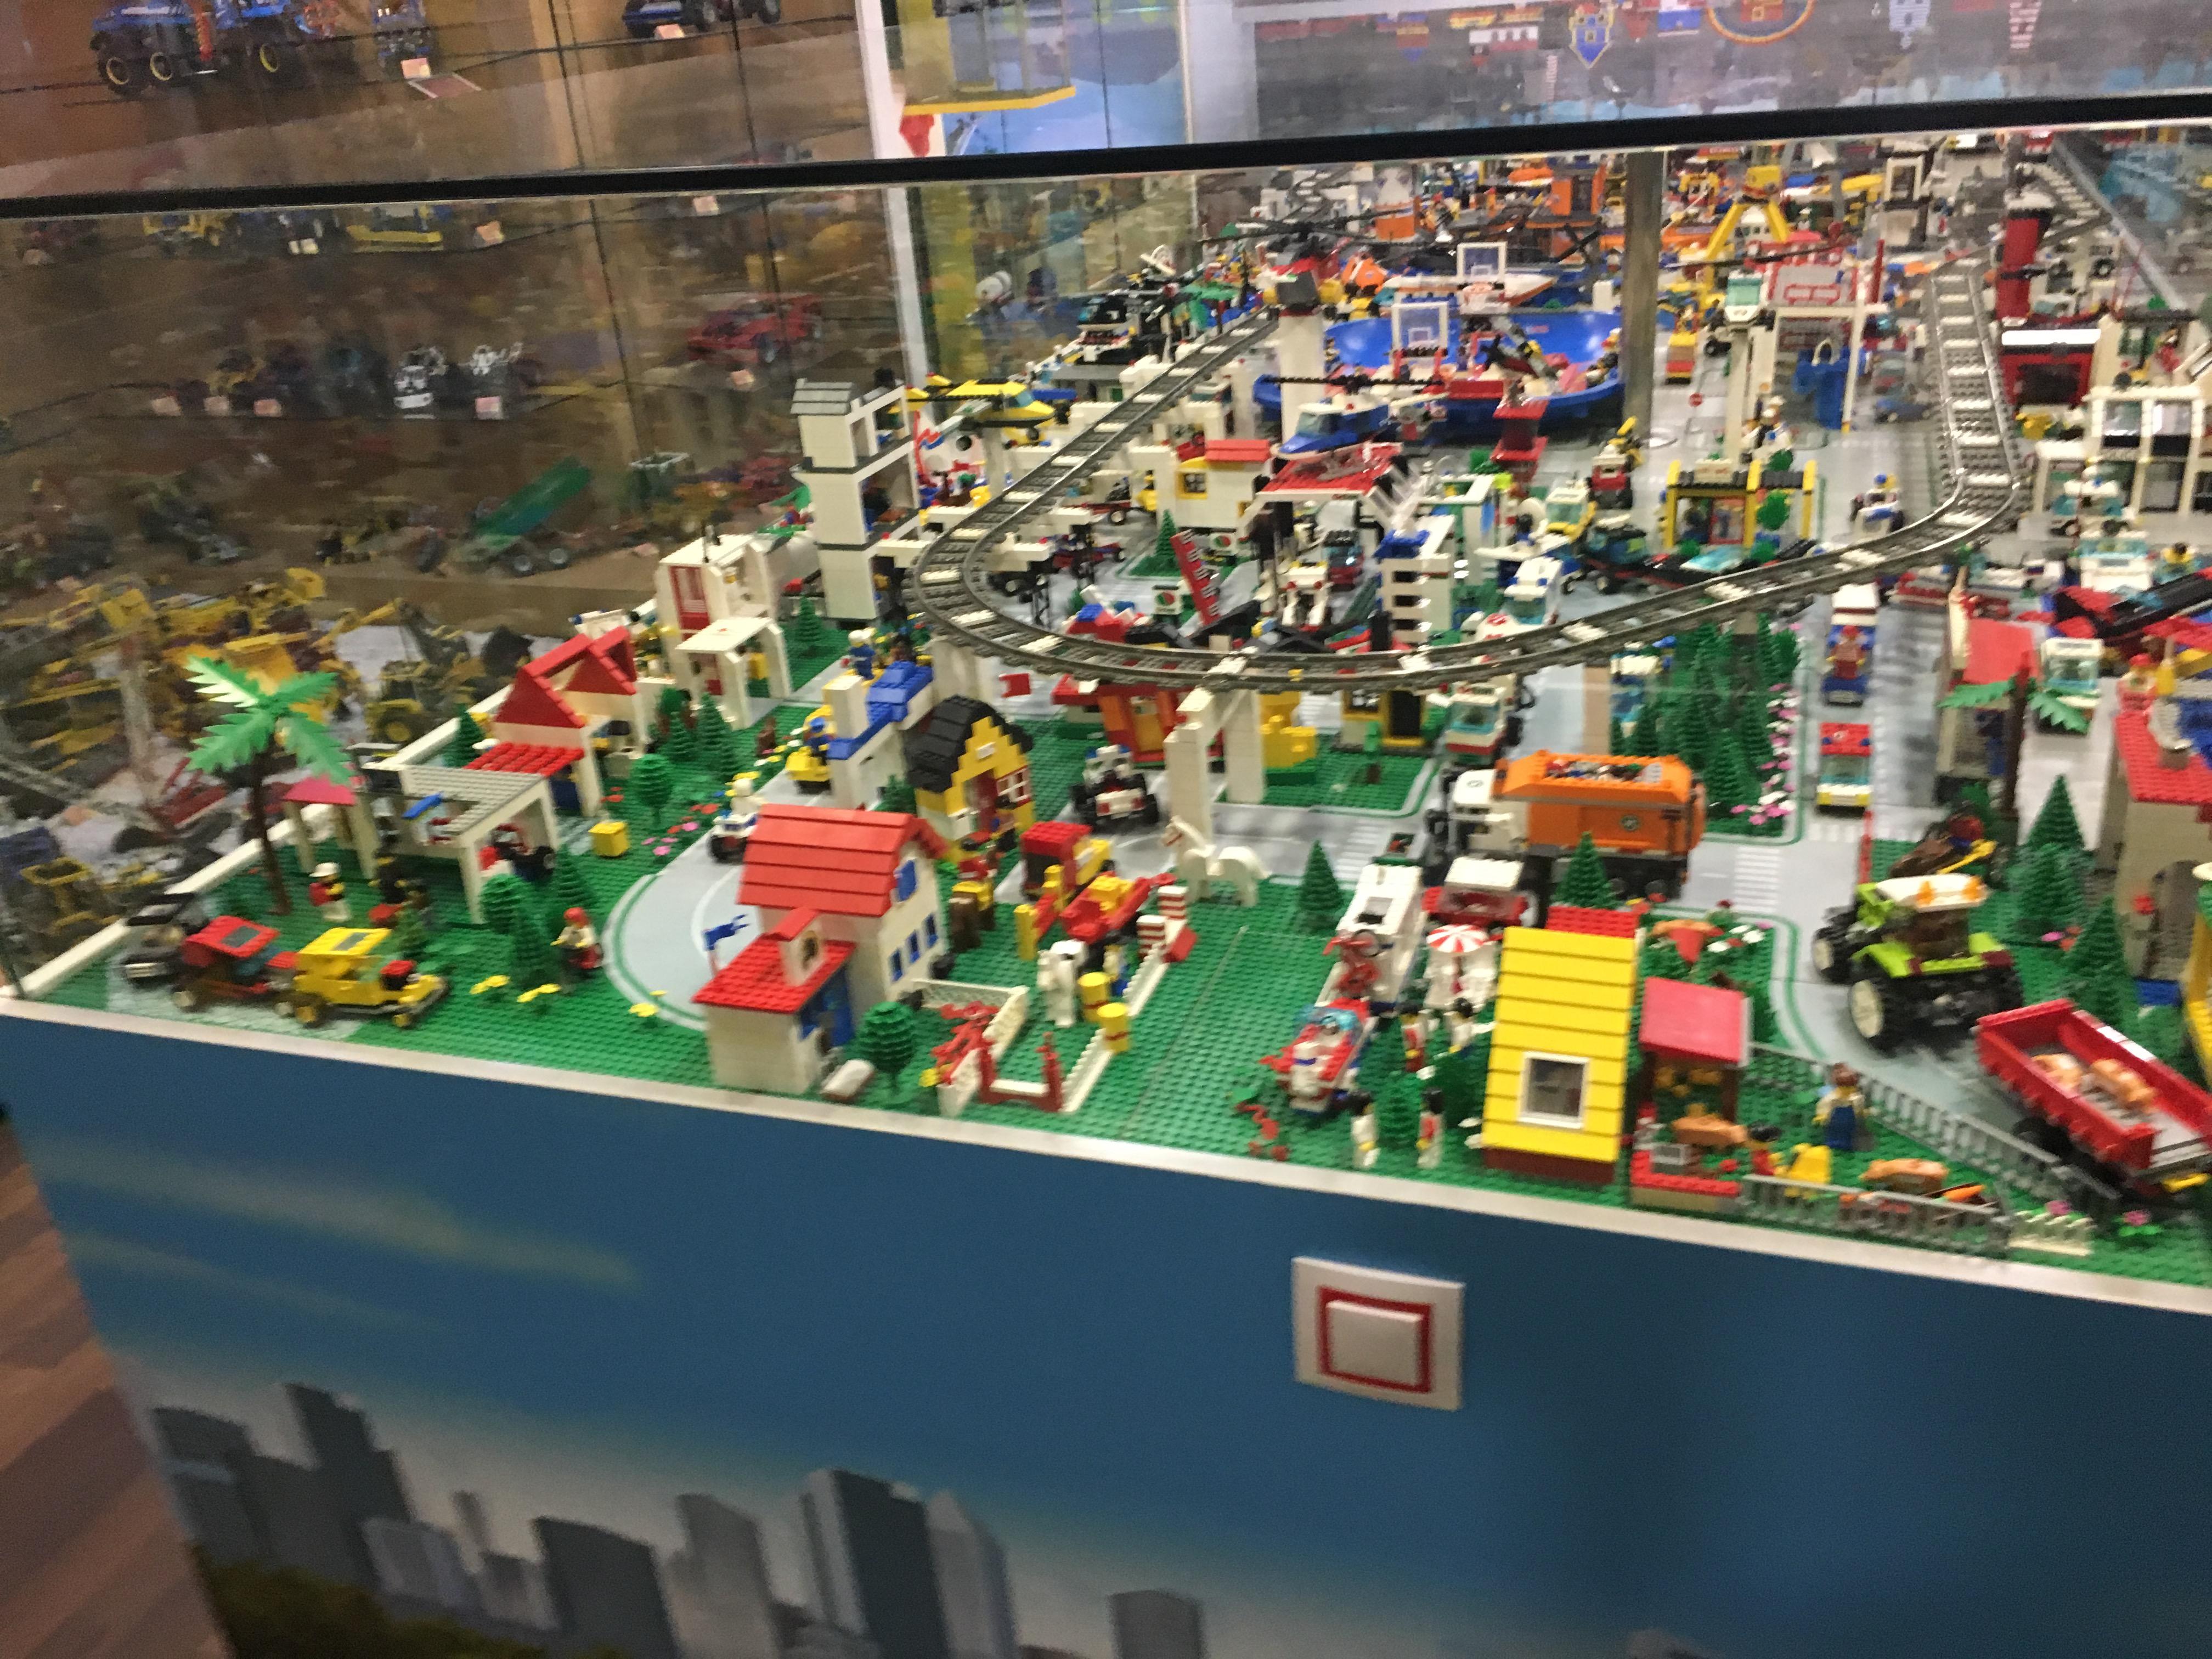 LEGO city layout display